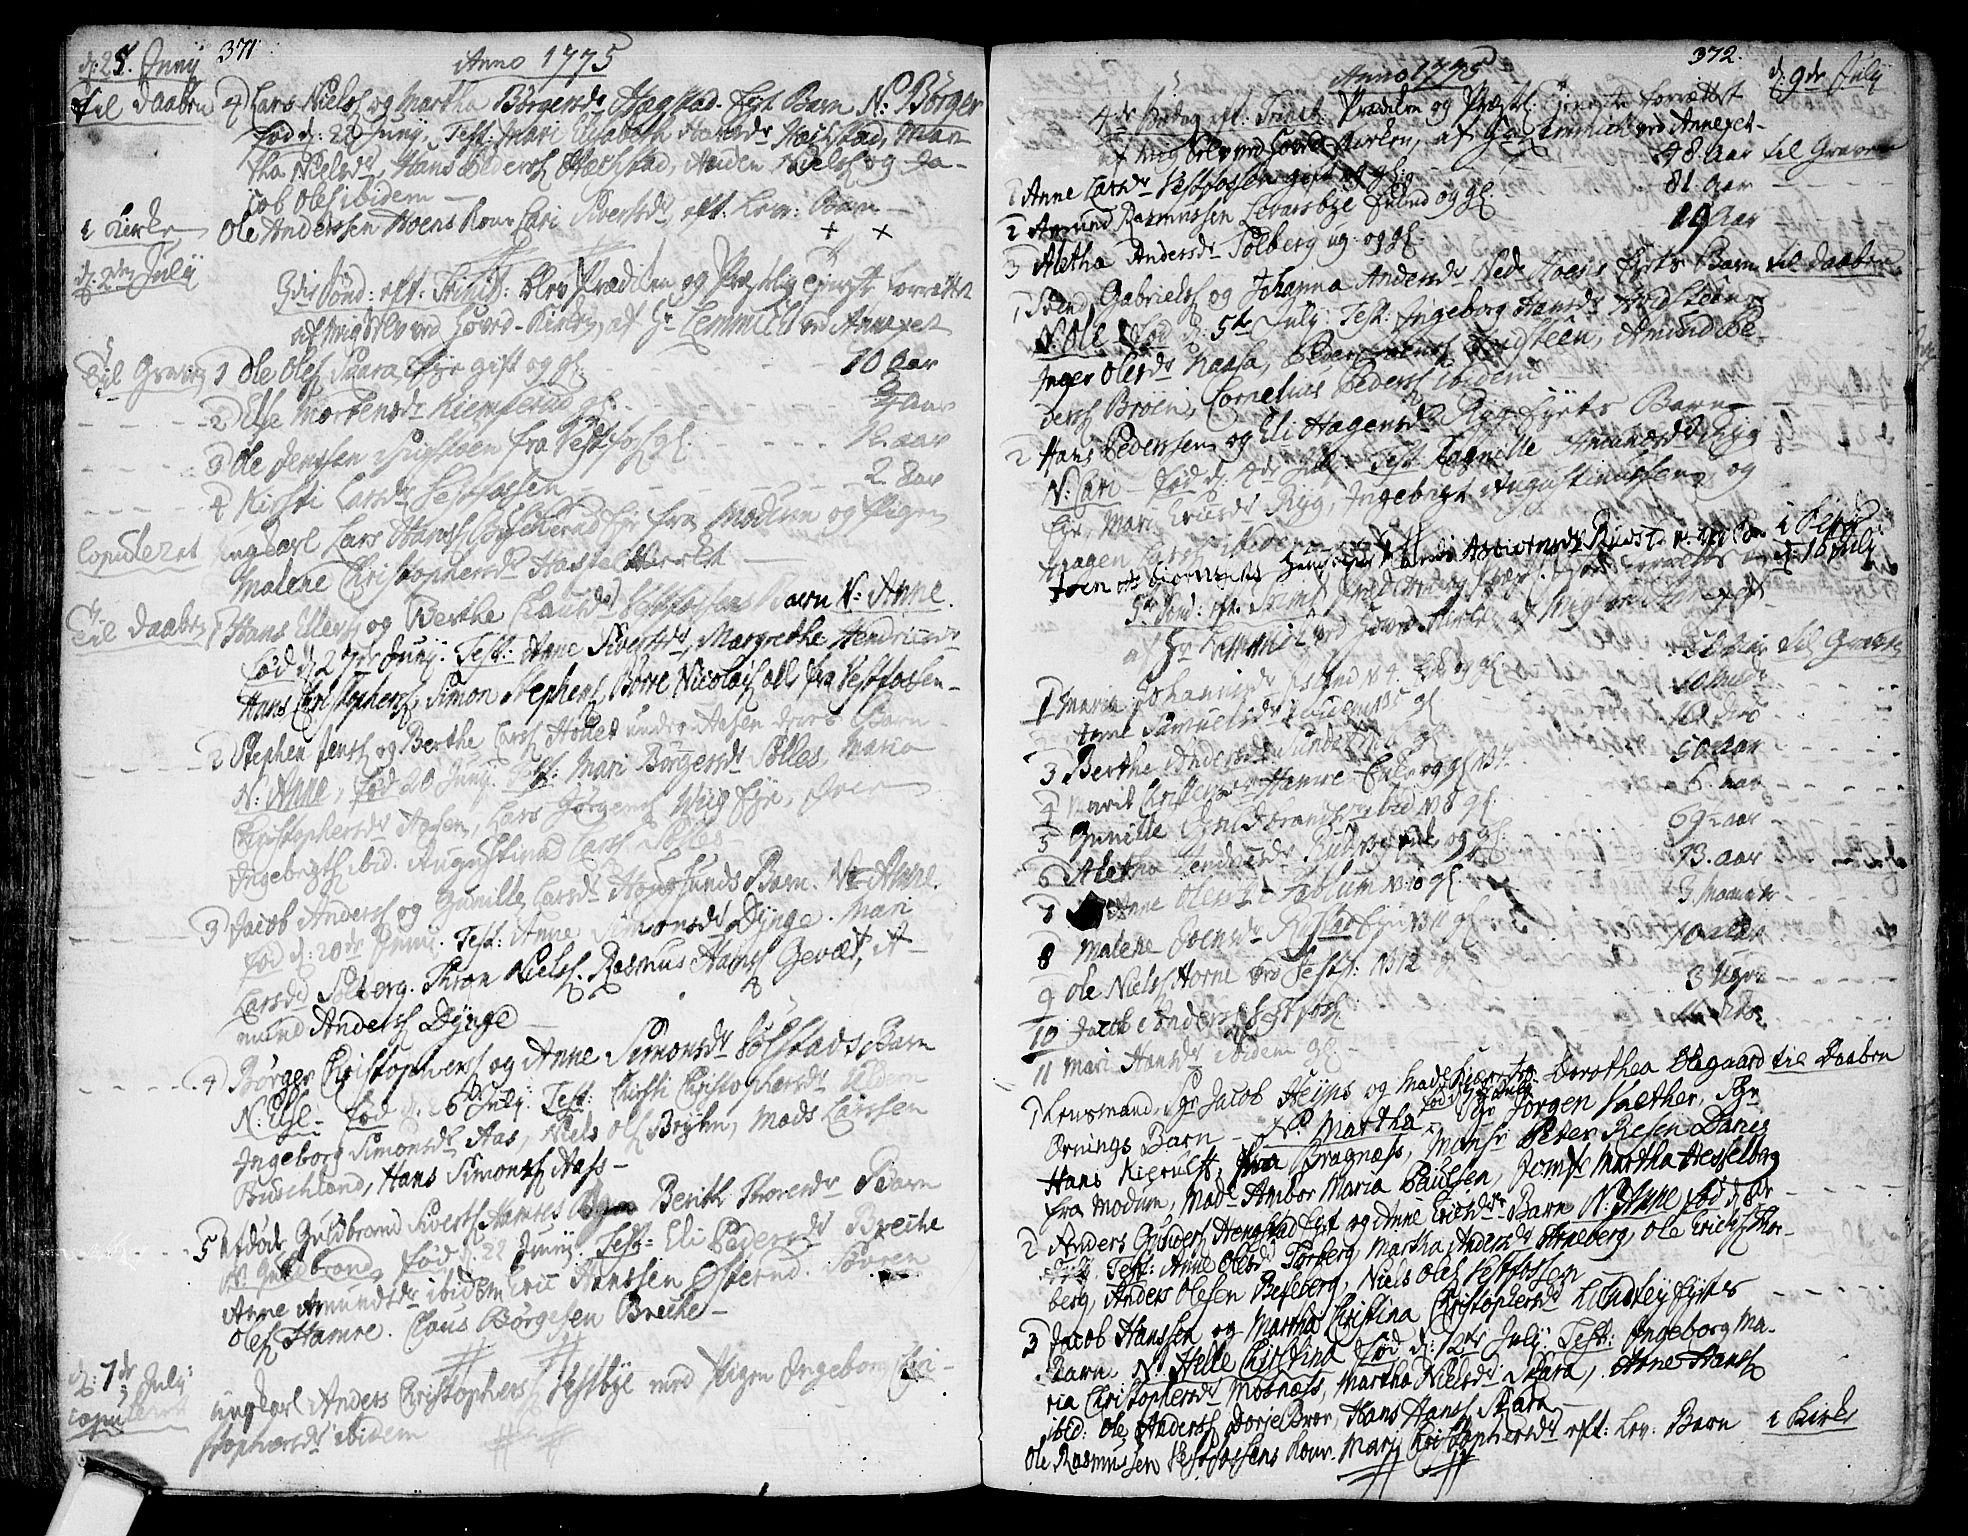 SAKO, Eiker kirkebøker, F/Fa/L0008: Ministerialbok nr. I 8, 1764-1788, s. 371-372